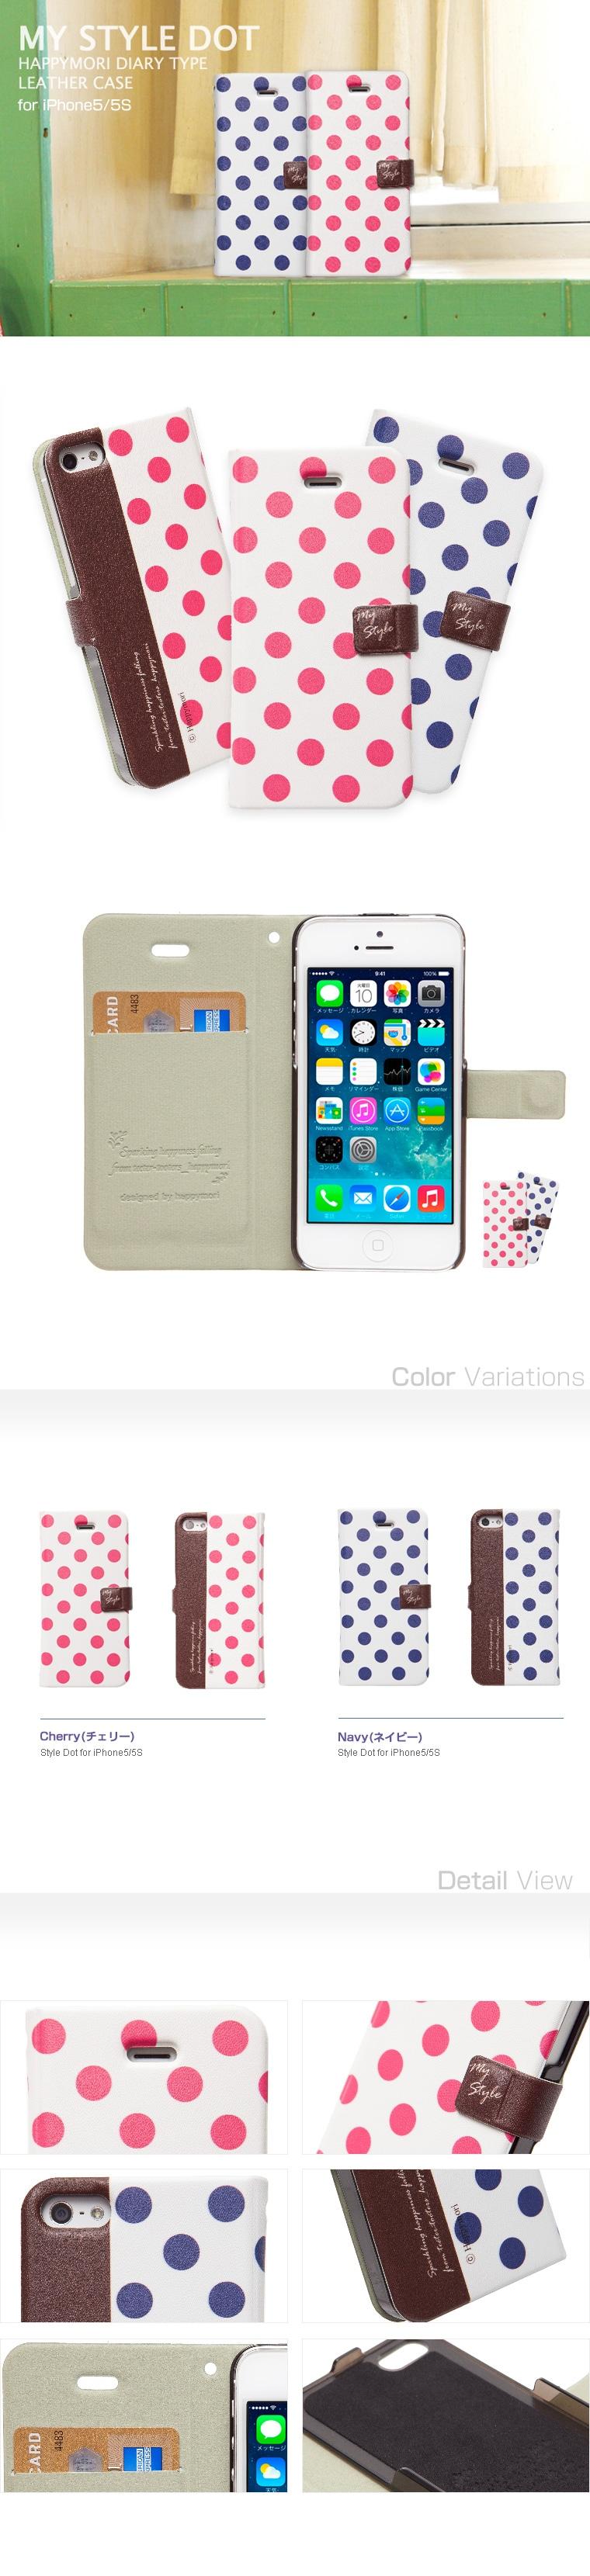 Happymori iPhone5S/5 Style Dot Diary (スタイルドット ダイアリー)